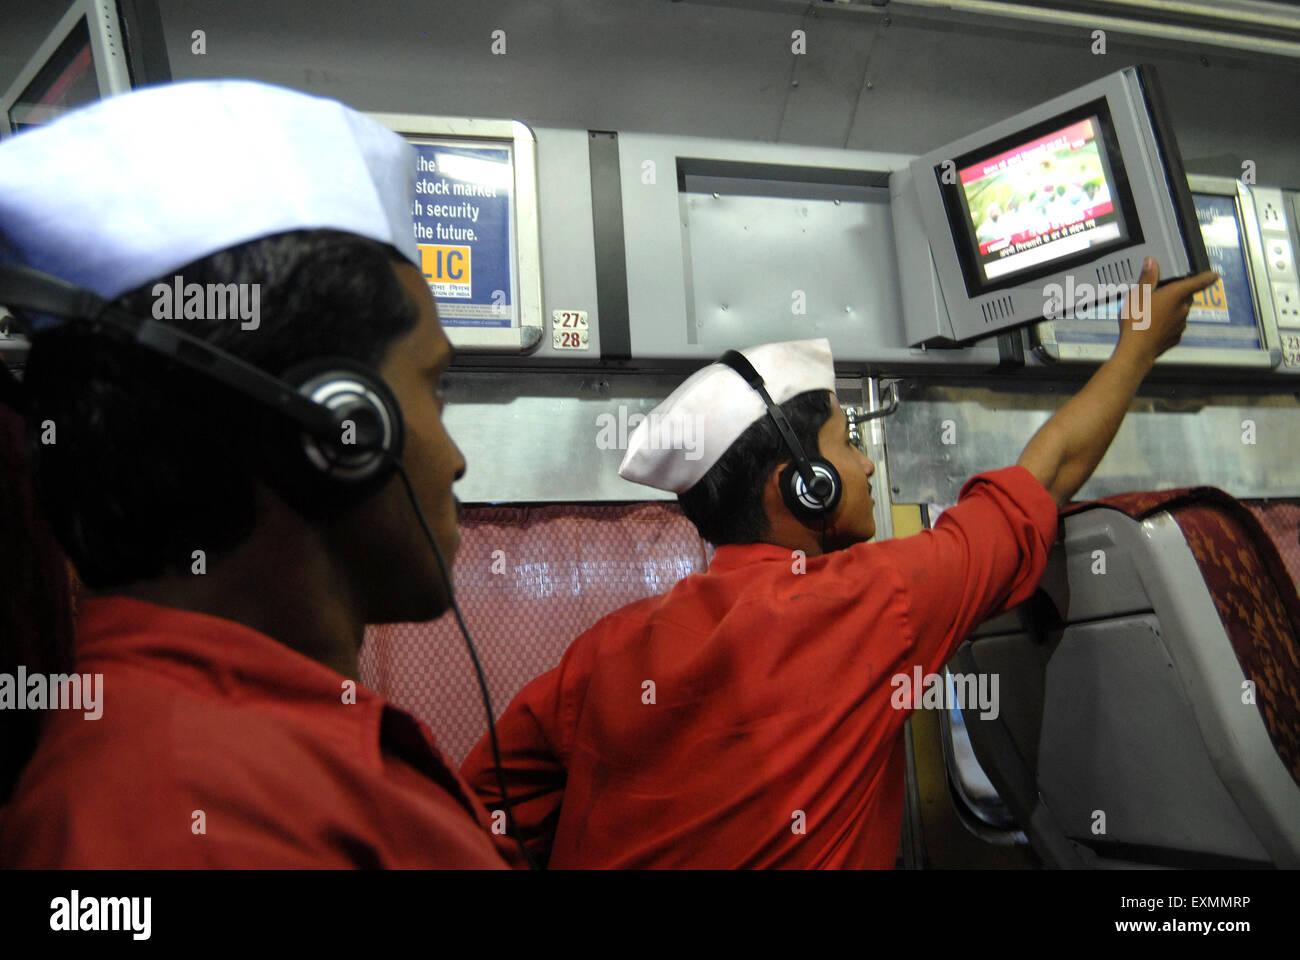 Eisenbahn-Porter Fernsehen Eisenbahnen experimenteller Basis Luft einzuführen konditioniert Drehgestell Mumbai Stockbild